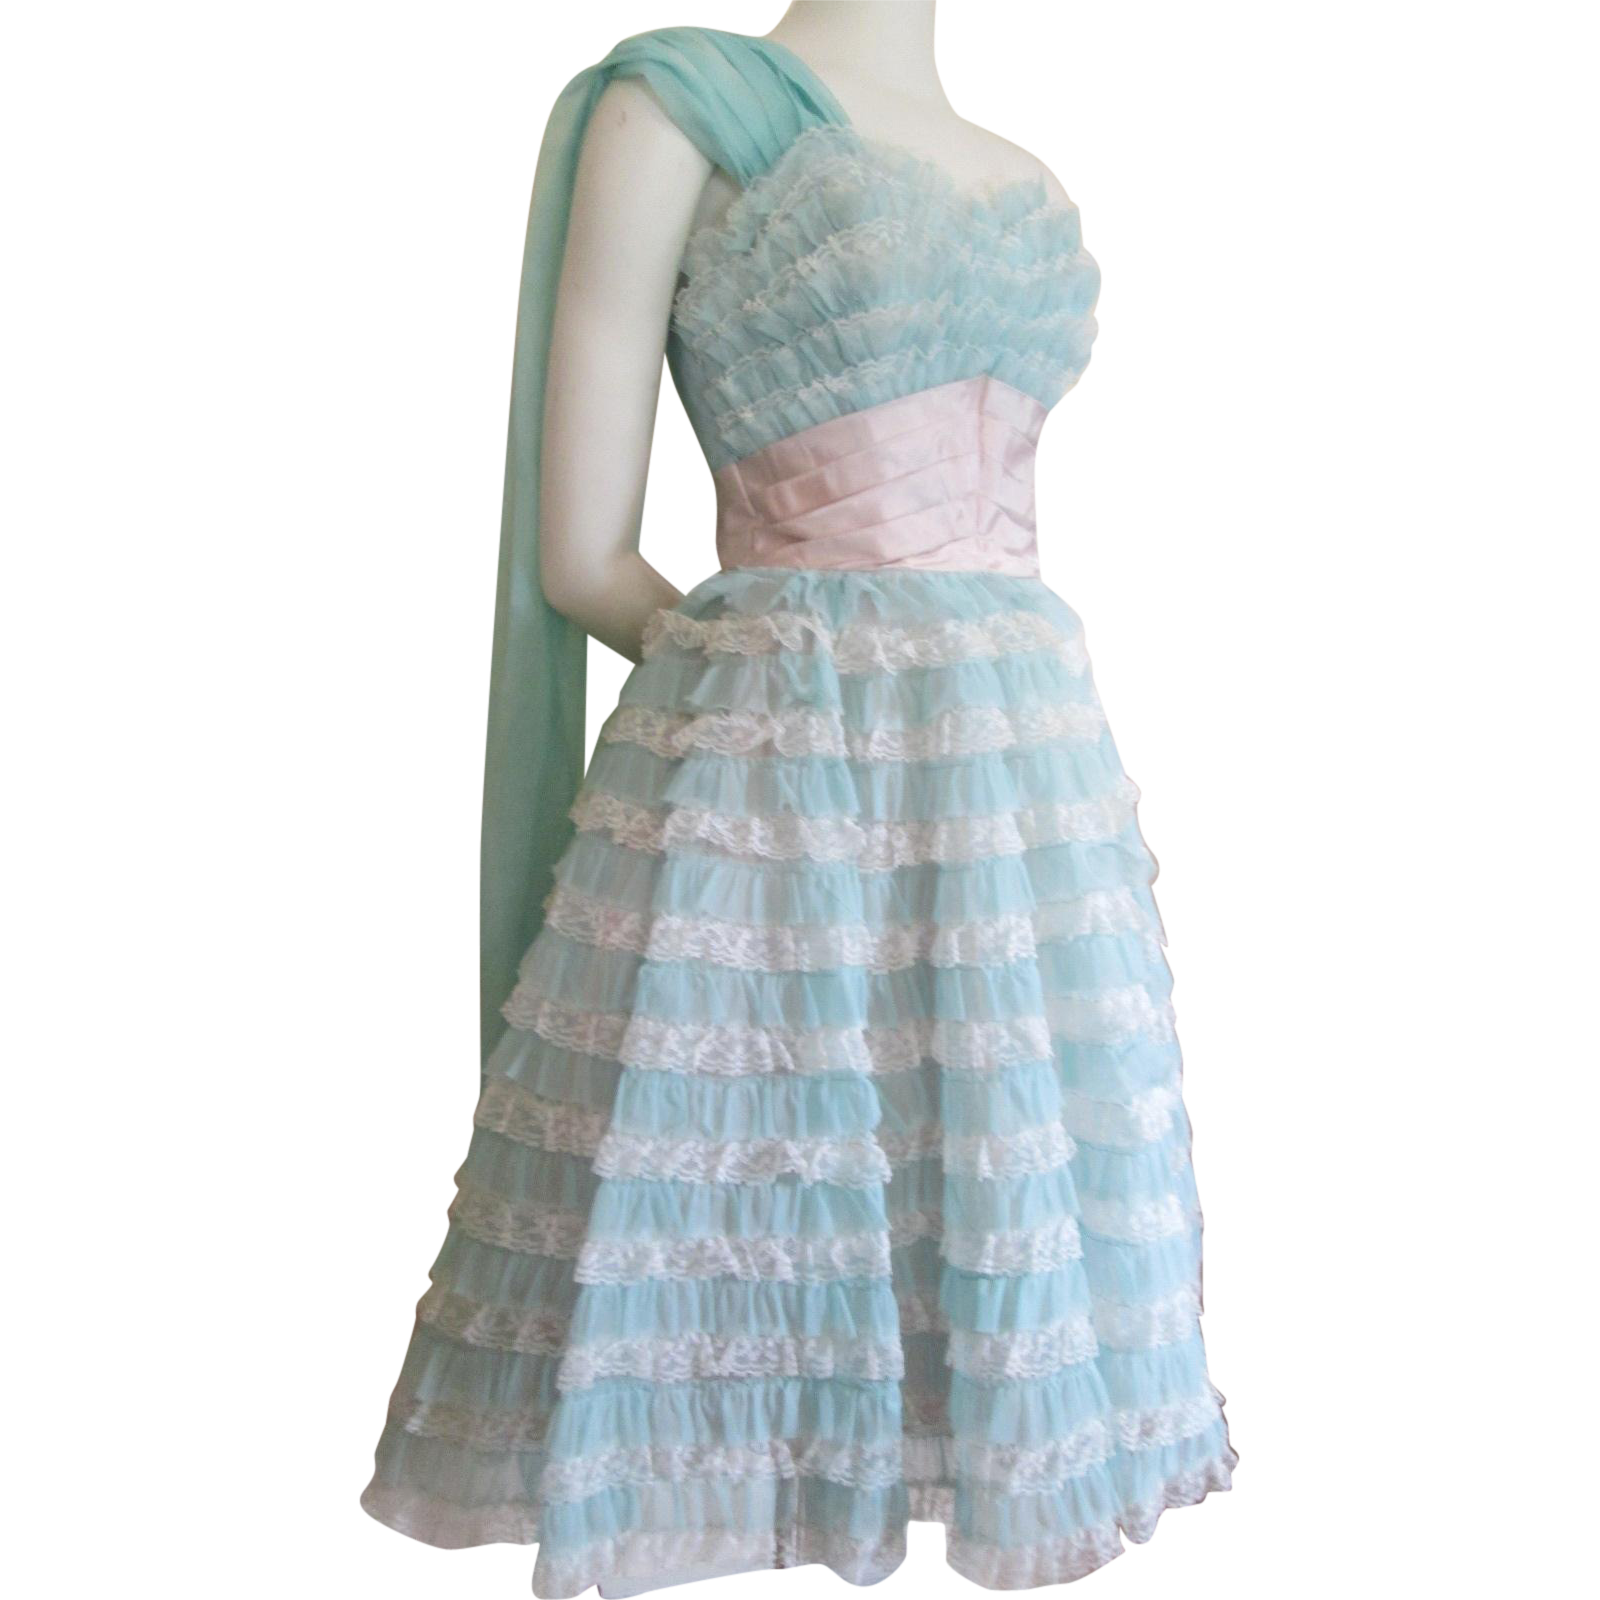 Vintage 1950s Party Dress Teal Blue Nylon Lace Ruffles Cummerbund ...